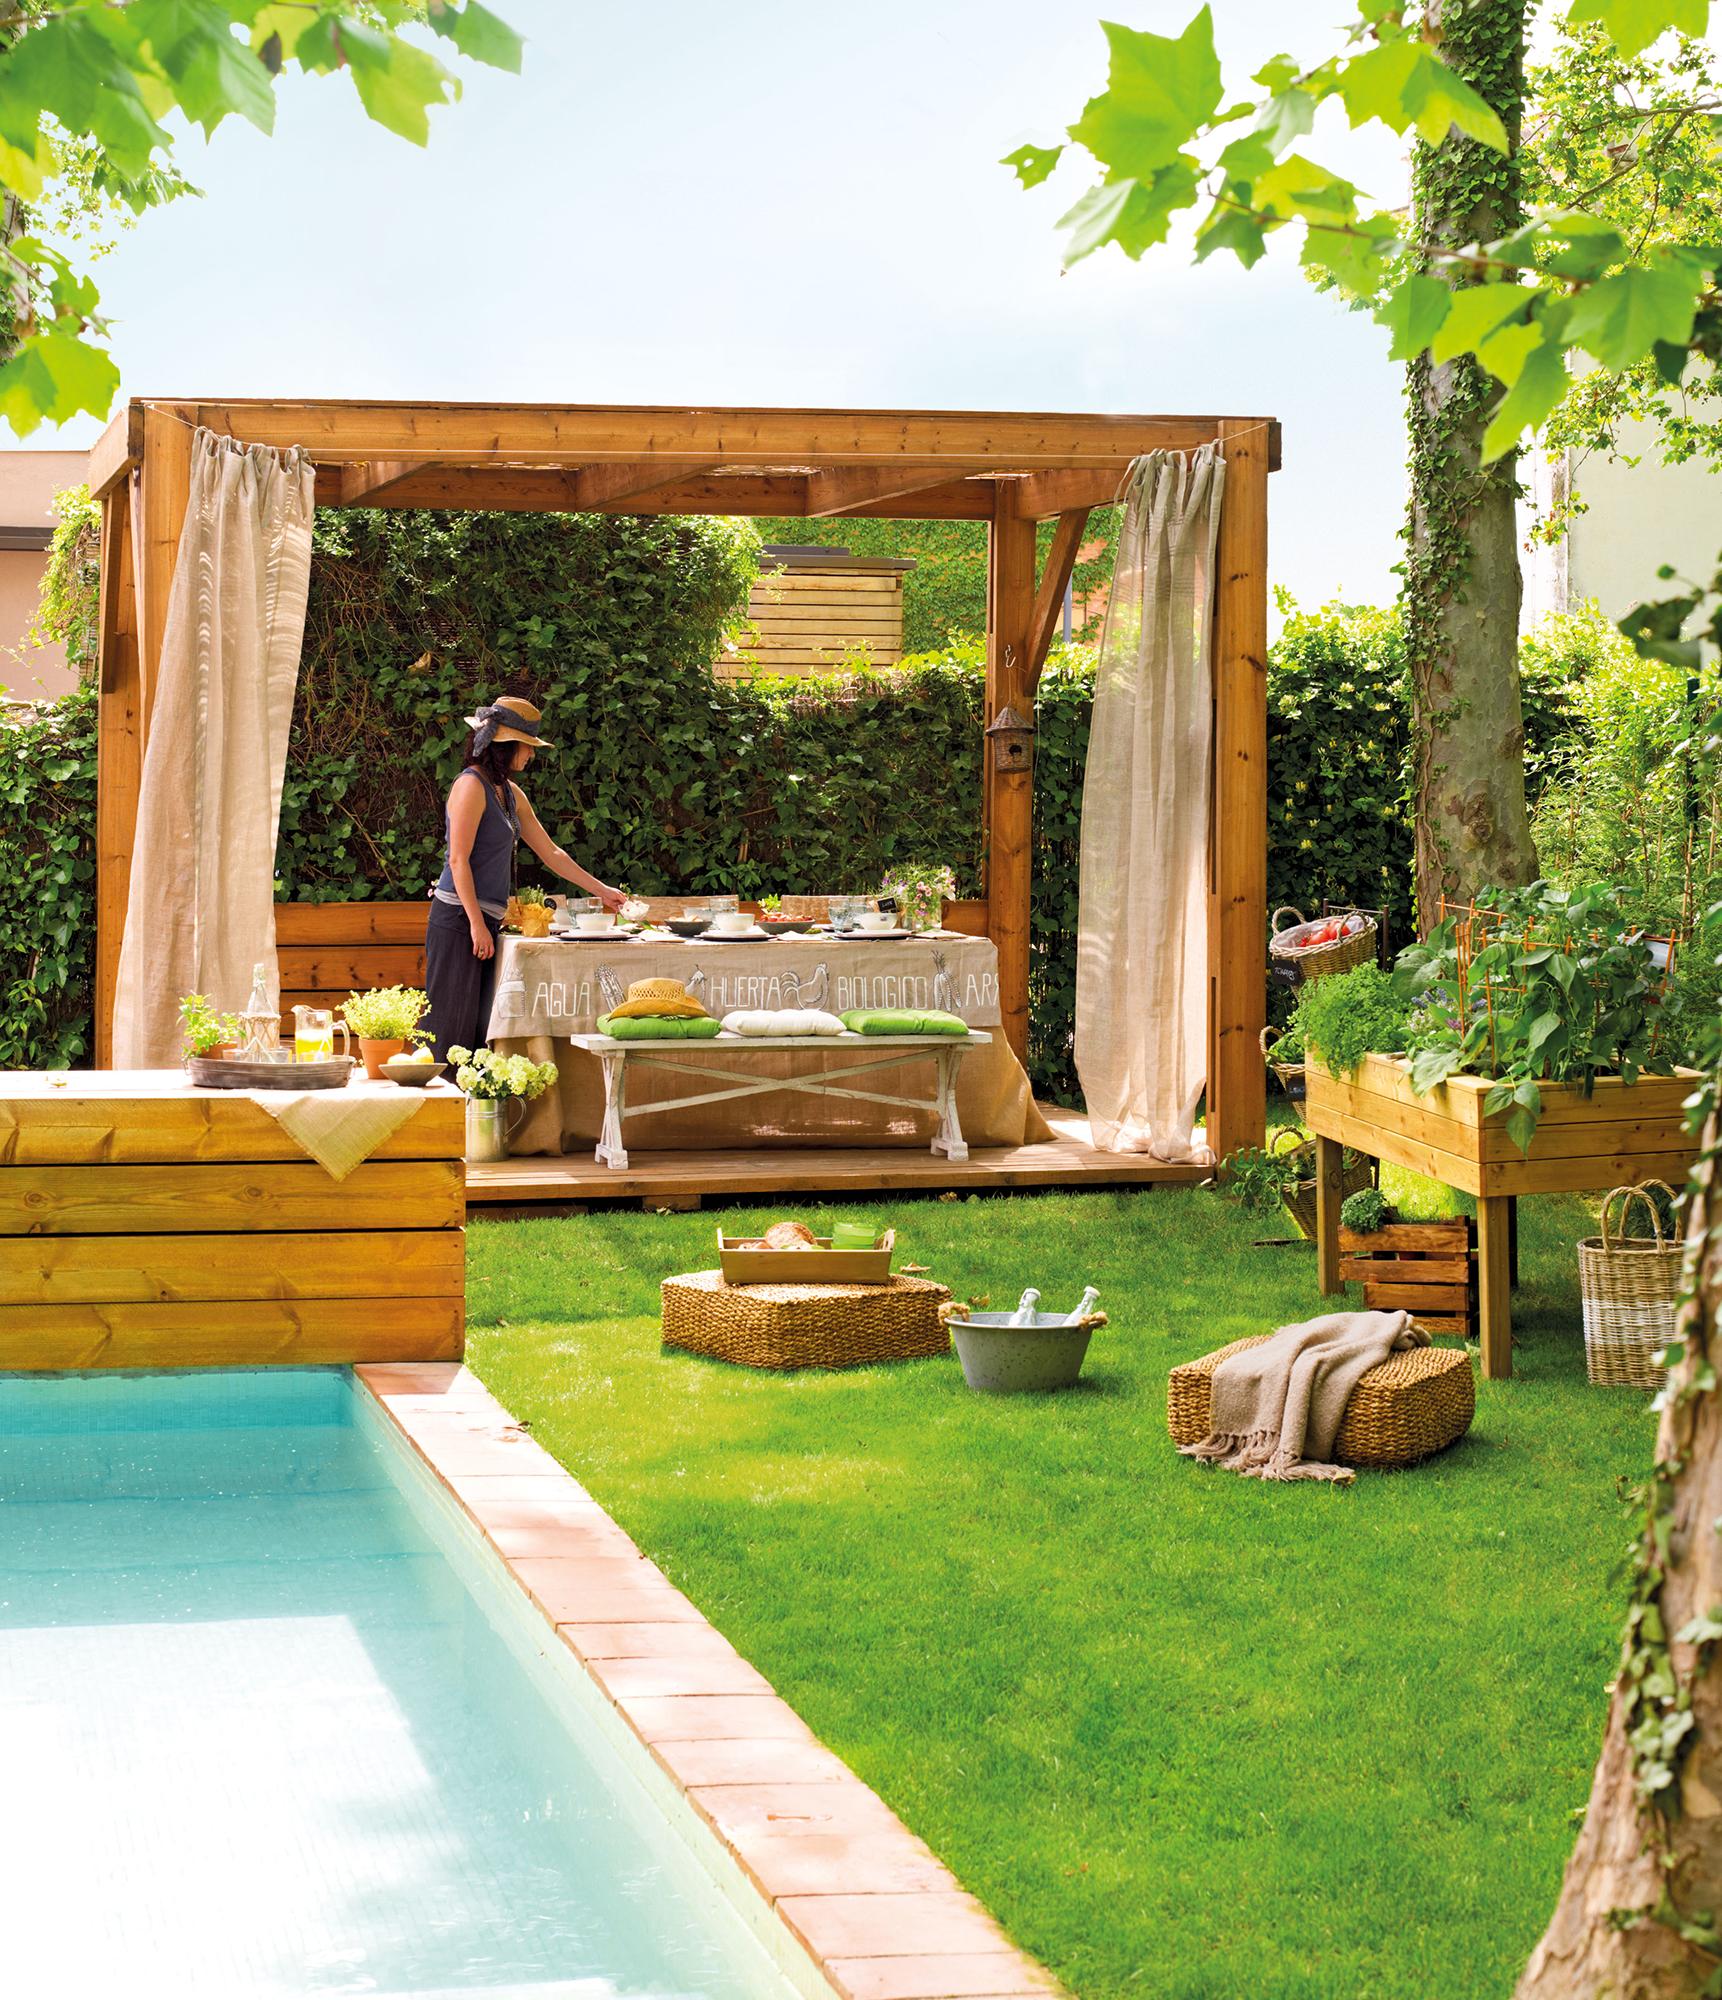 pergolas metalicas para jardin perfect pergolas metalicas para jardin with pergolas metalicas. Black Bedroom Furniture Sets. Home Design Ideas